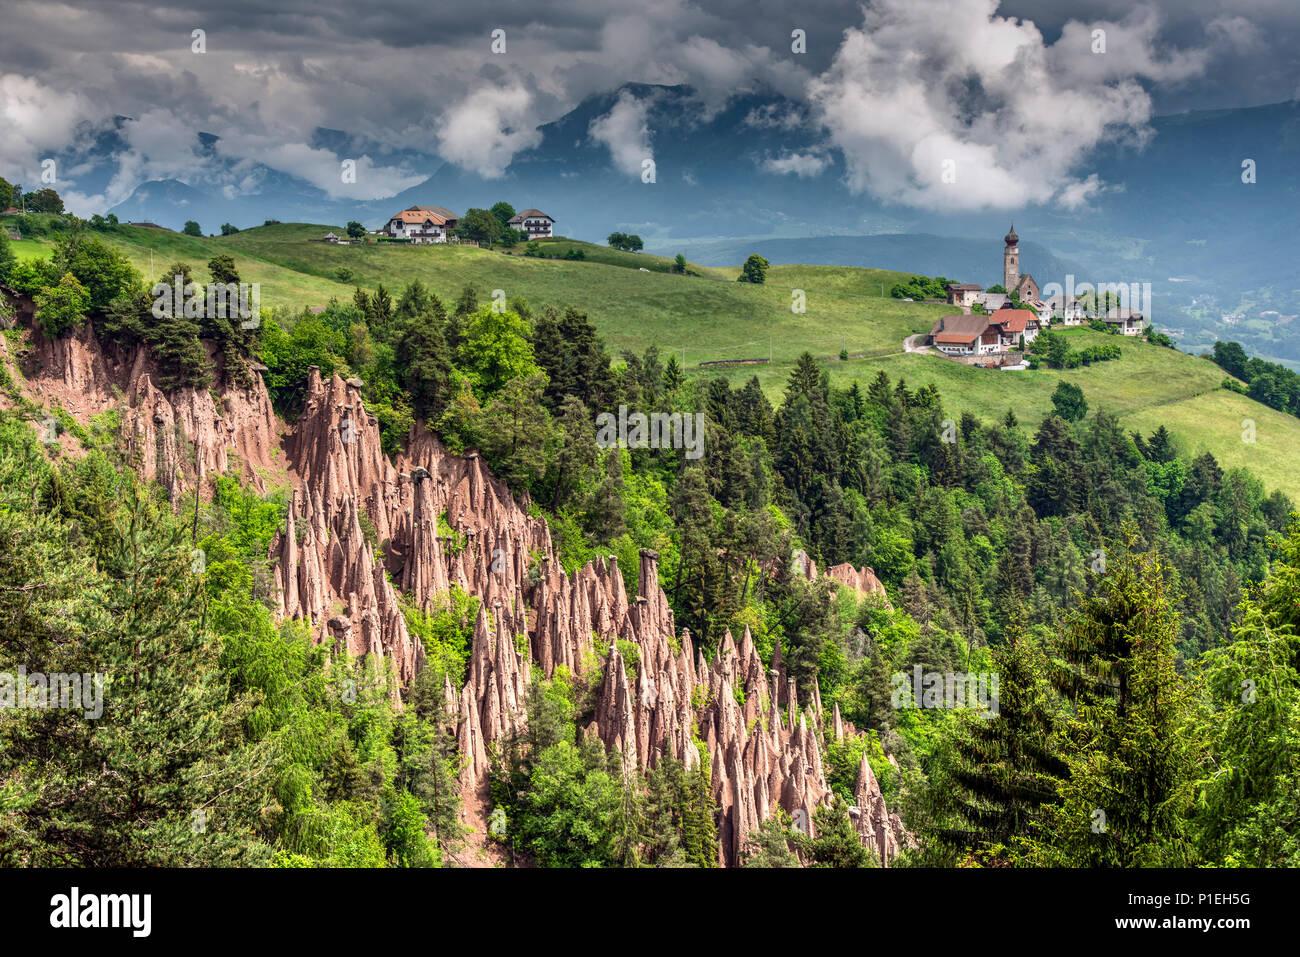 Erdpyramiden, Ritten - Ritten, Trentino Alto Adige - Südtirol, Italien Stockbild